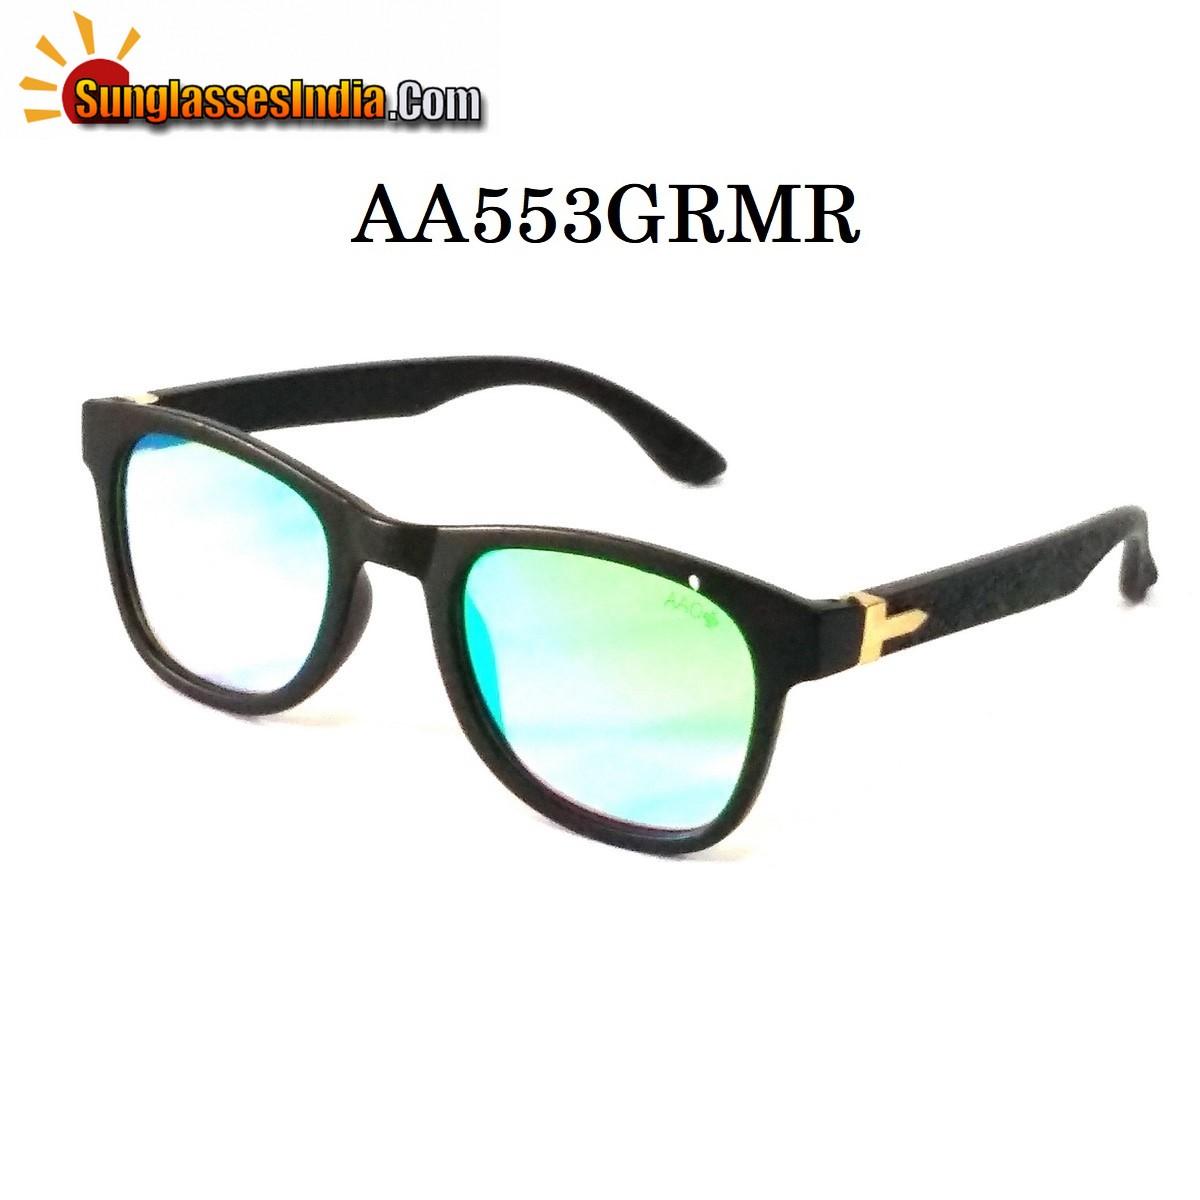 Green Mirror Wayfare Sunglasses